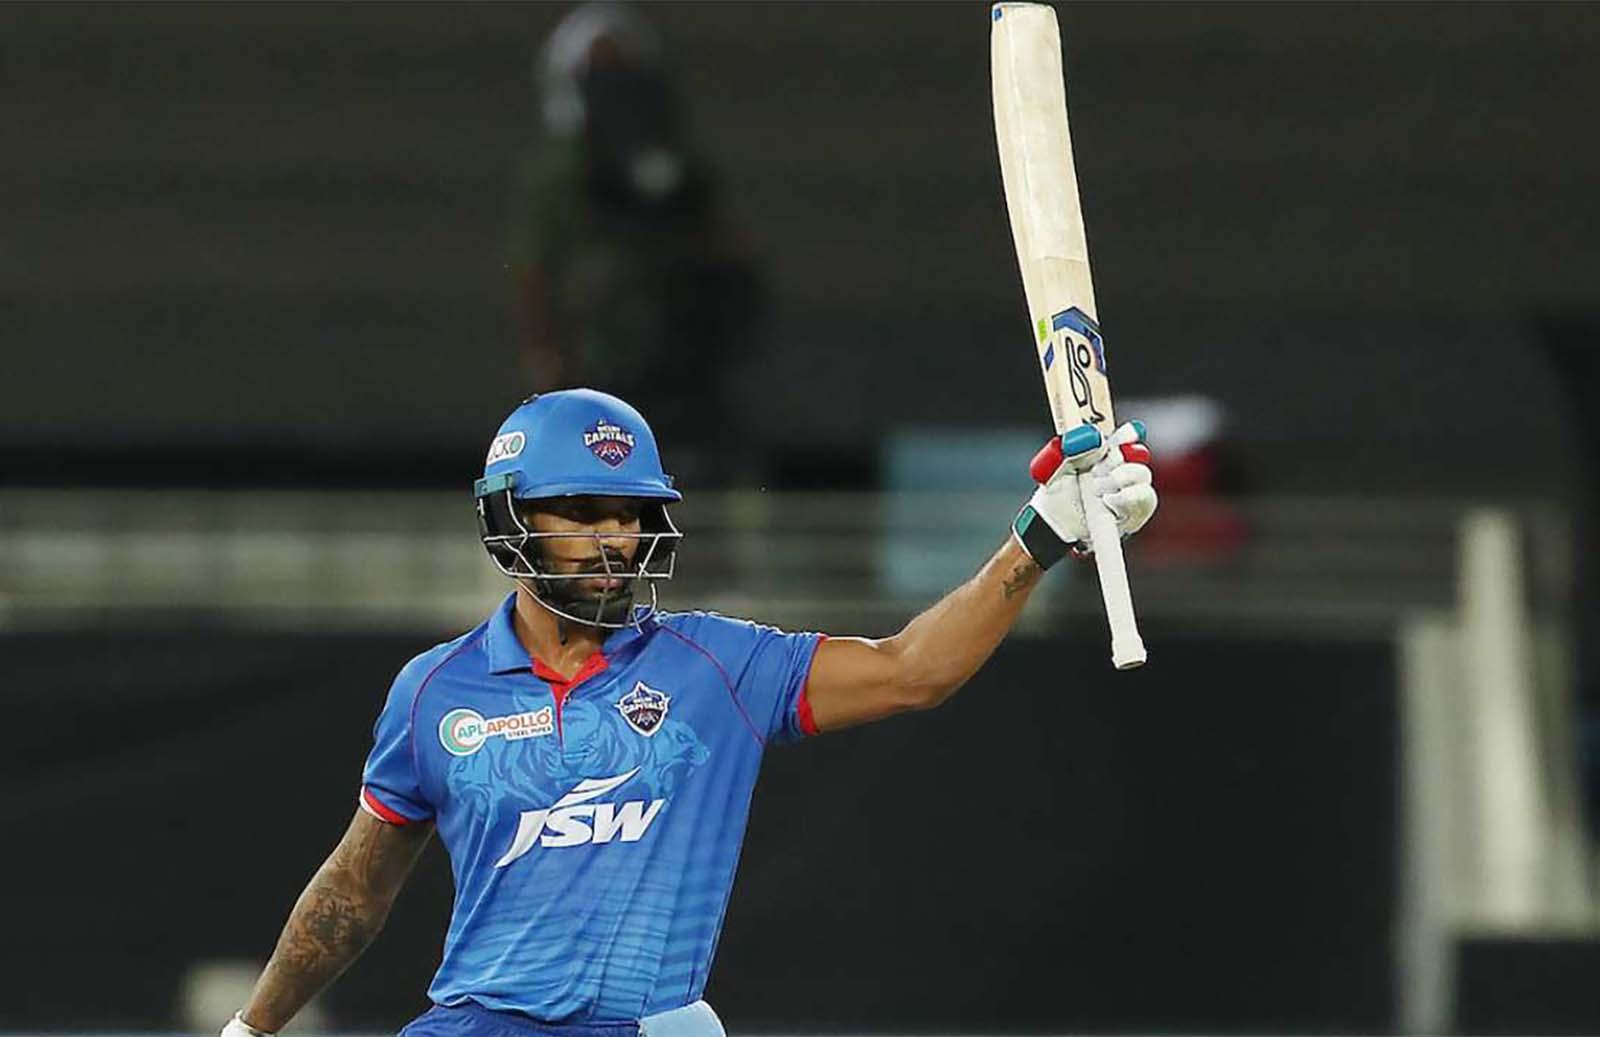 Running Faster, Feeling Fresher: Shikhar Dhawan Speaks on Scintillating Batting Form in IPL 2020